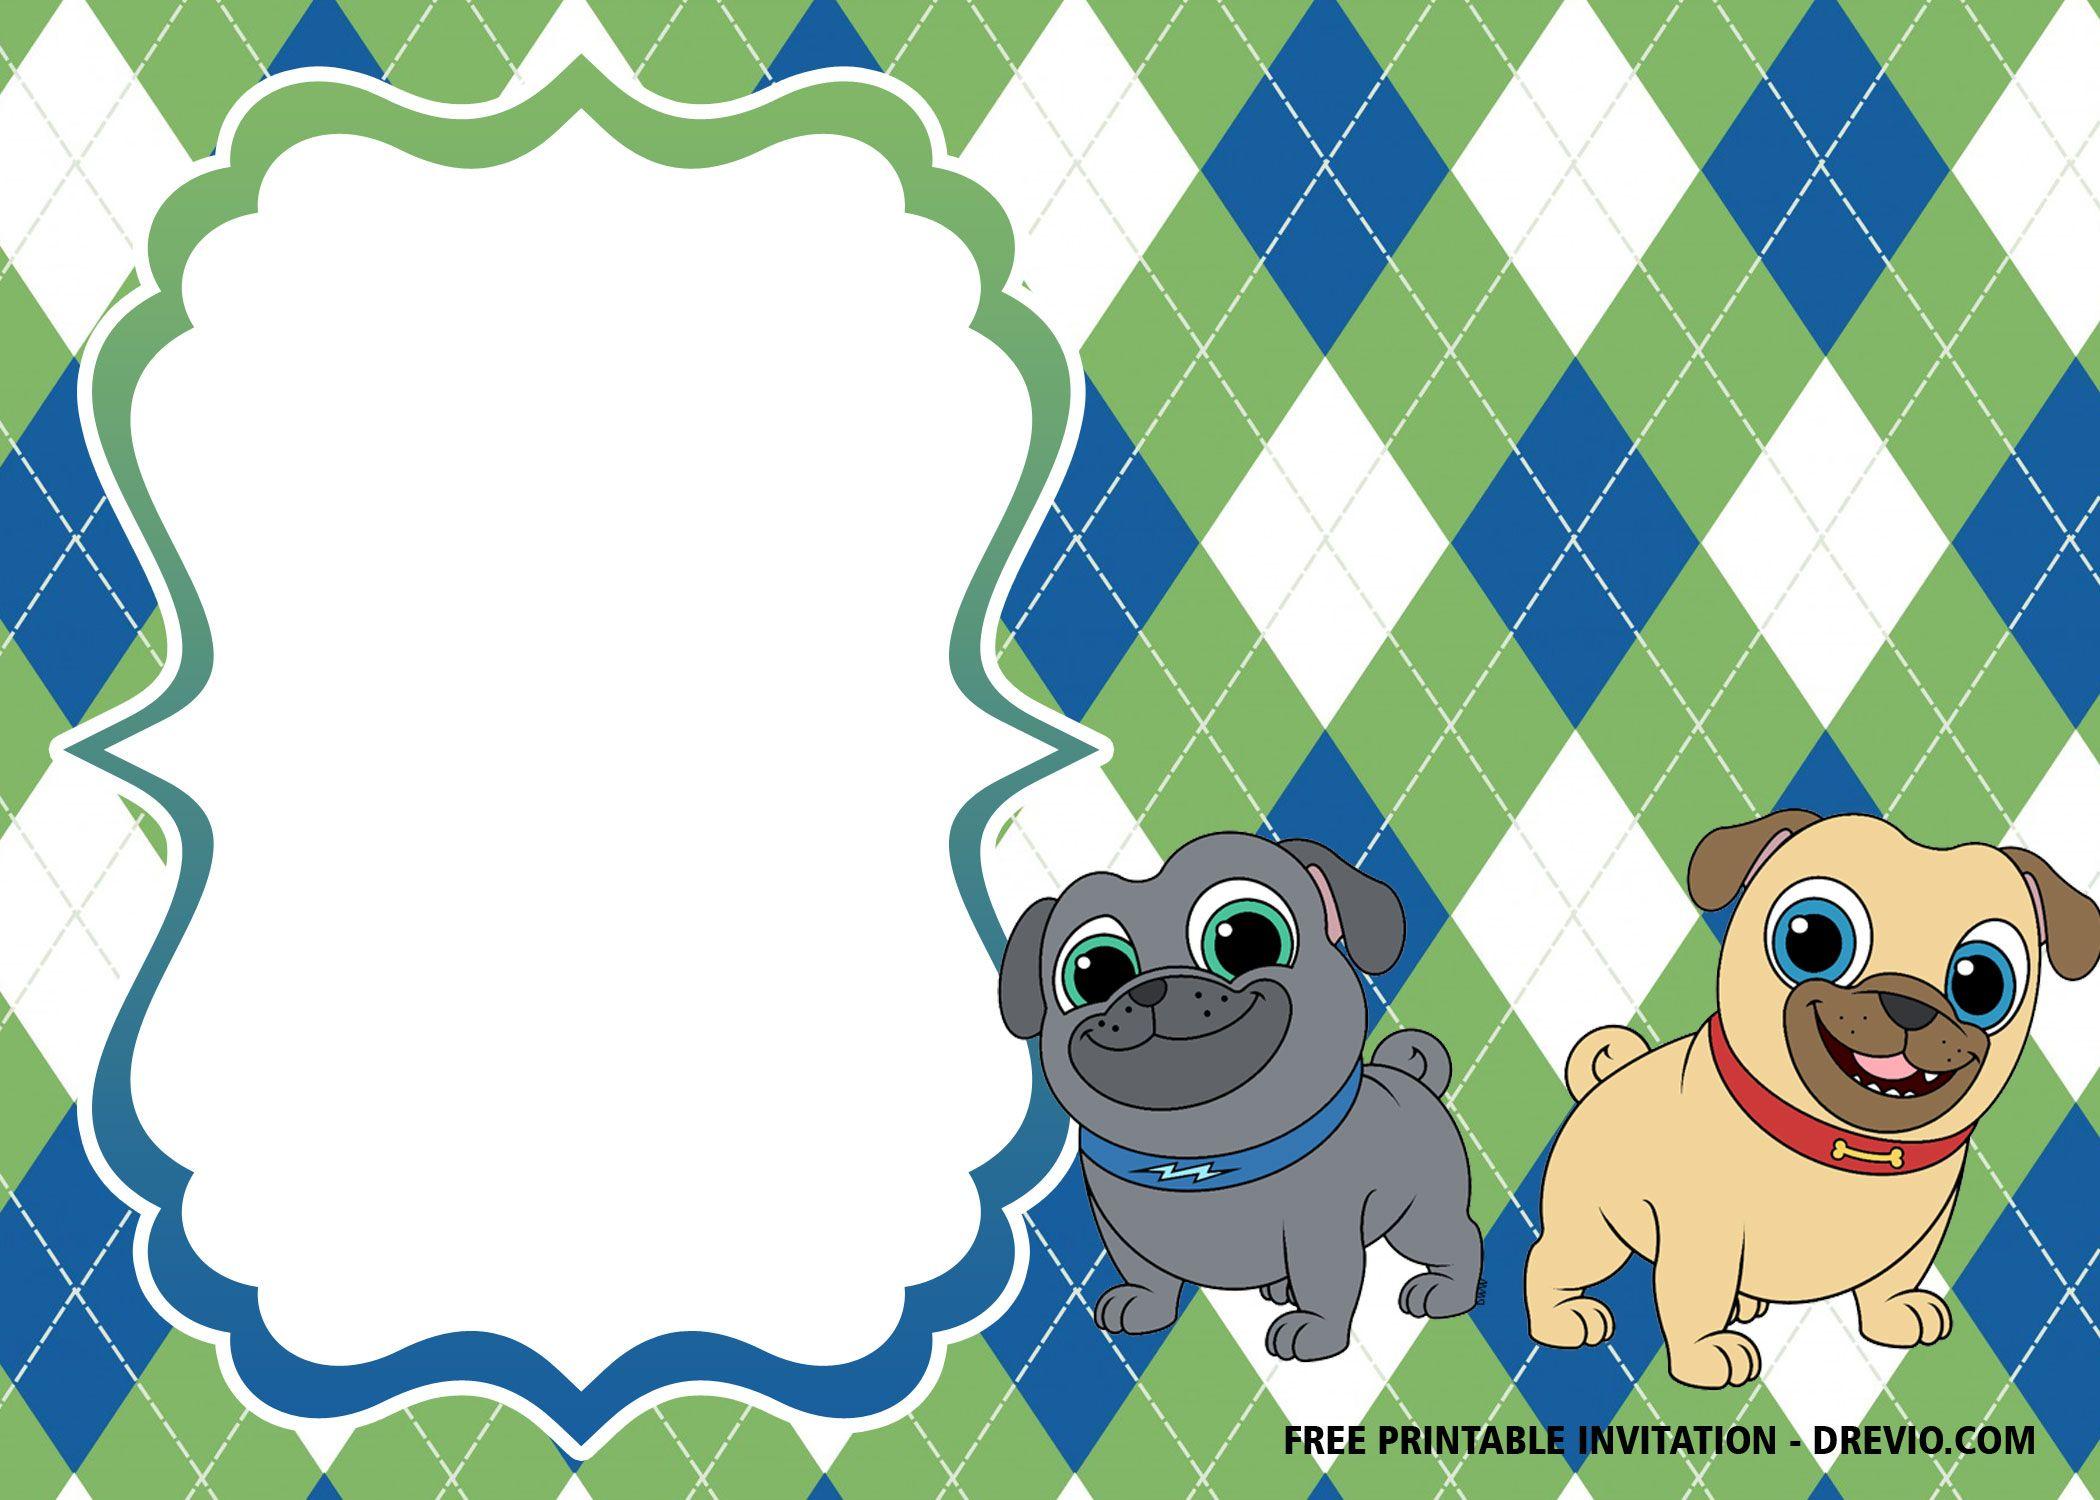 Free Disney Puppy Dog Pals Invitation Templates Free Printable Baby Shower Invitations Printable Baby Shower Invitations Printable Birthday Invitations